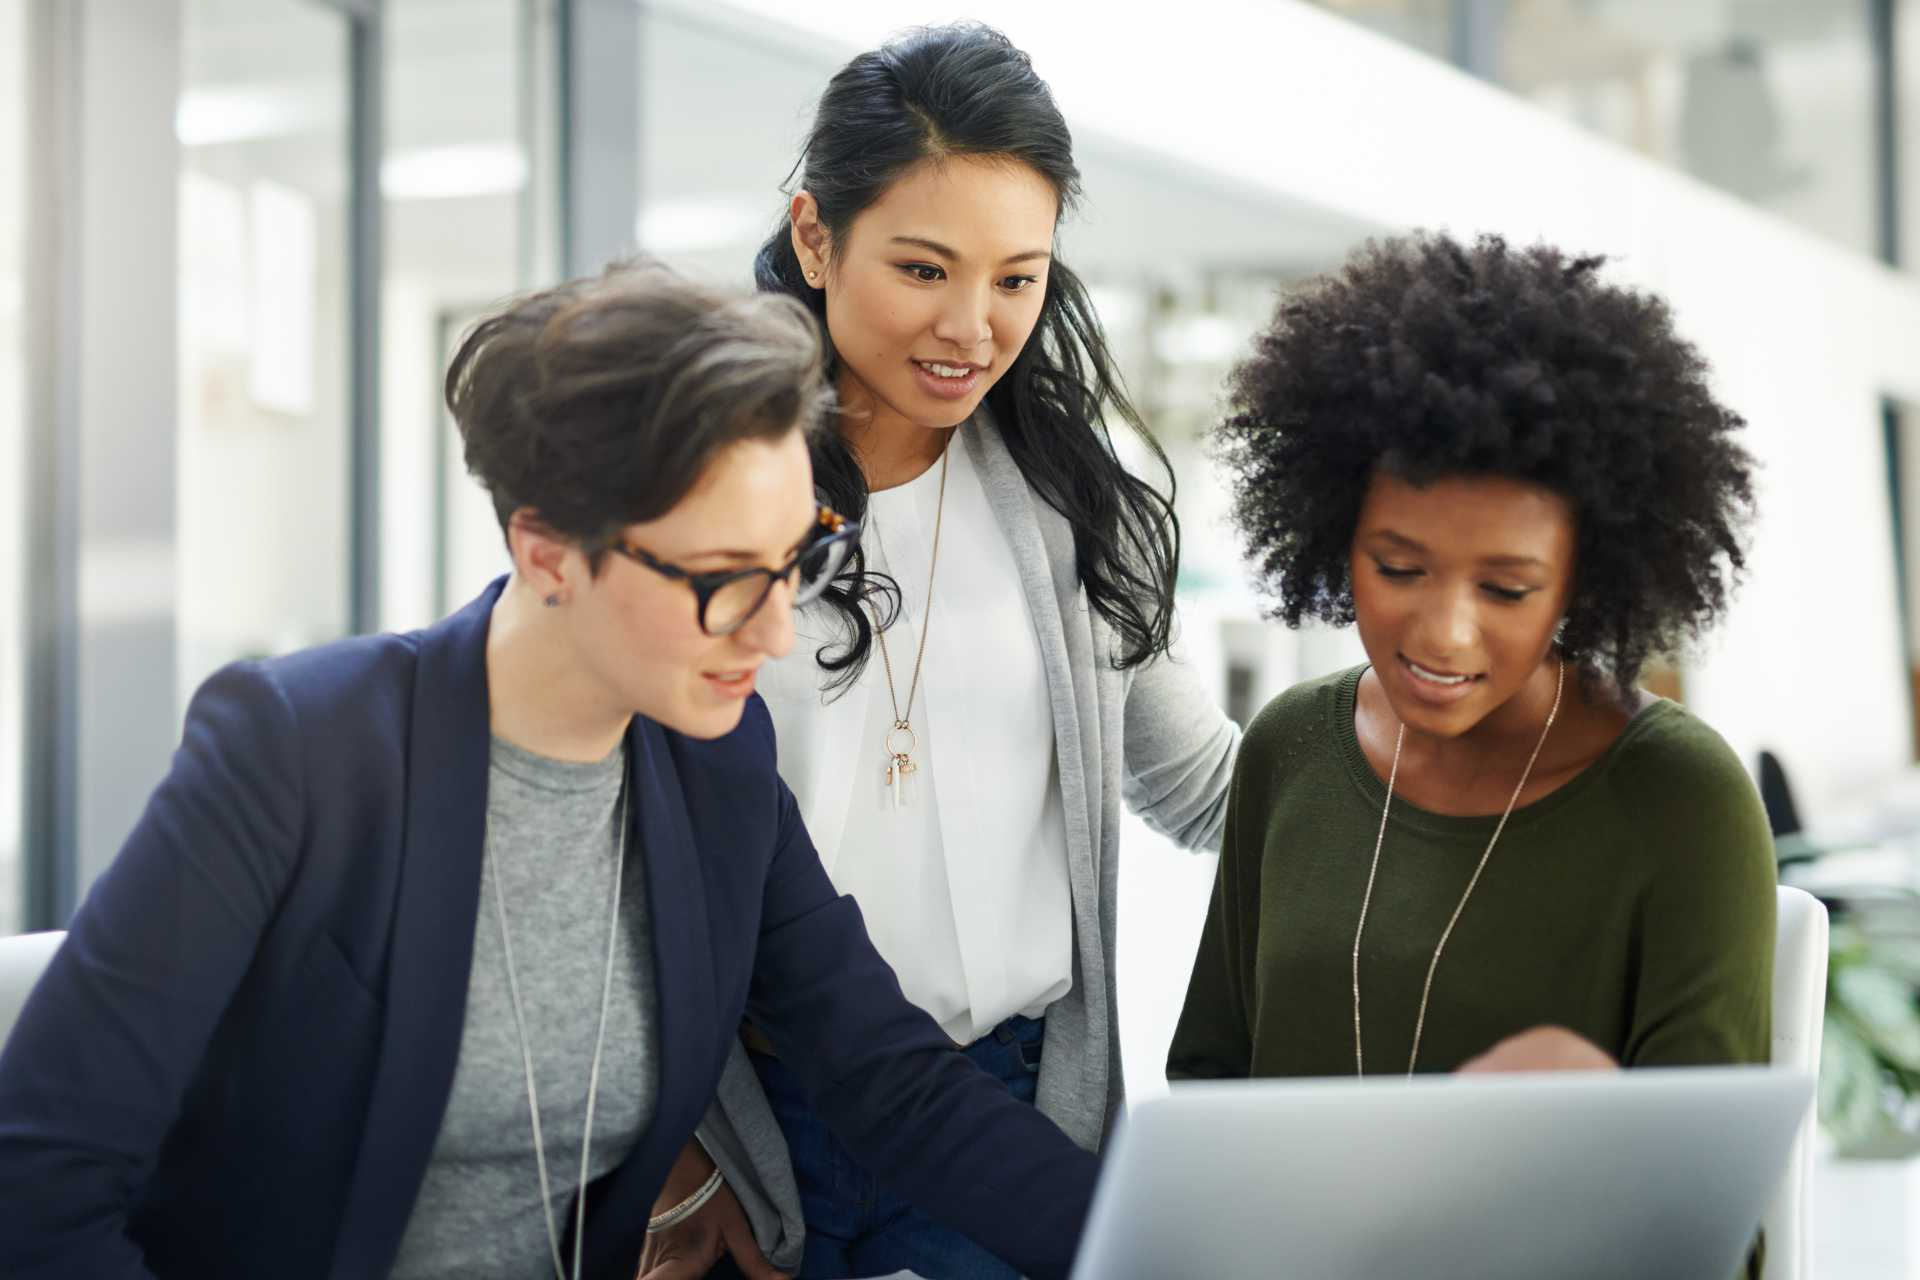 Change Management: How One Audit Team Ensures Consistent Onboarding